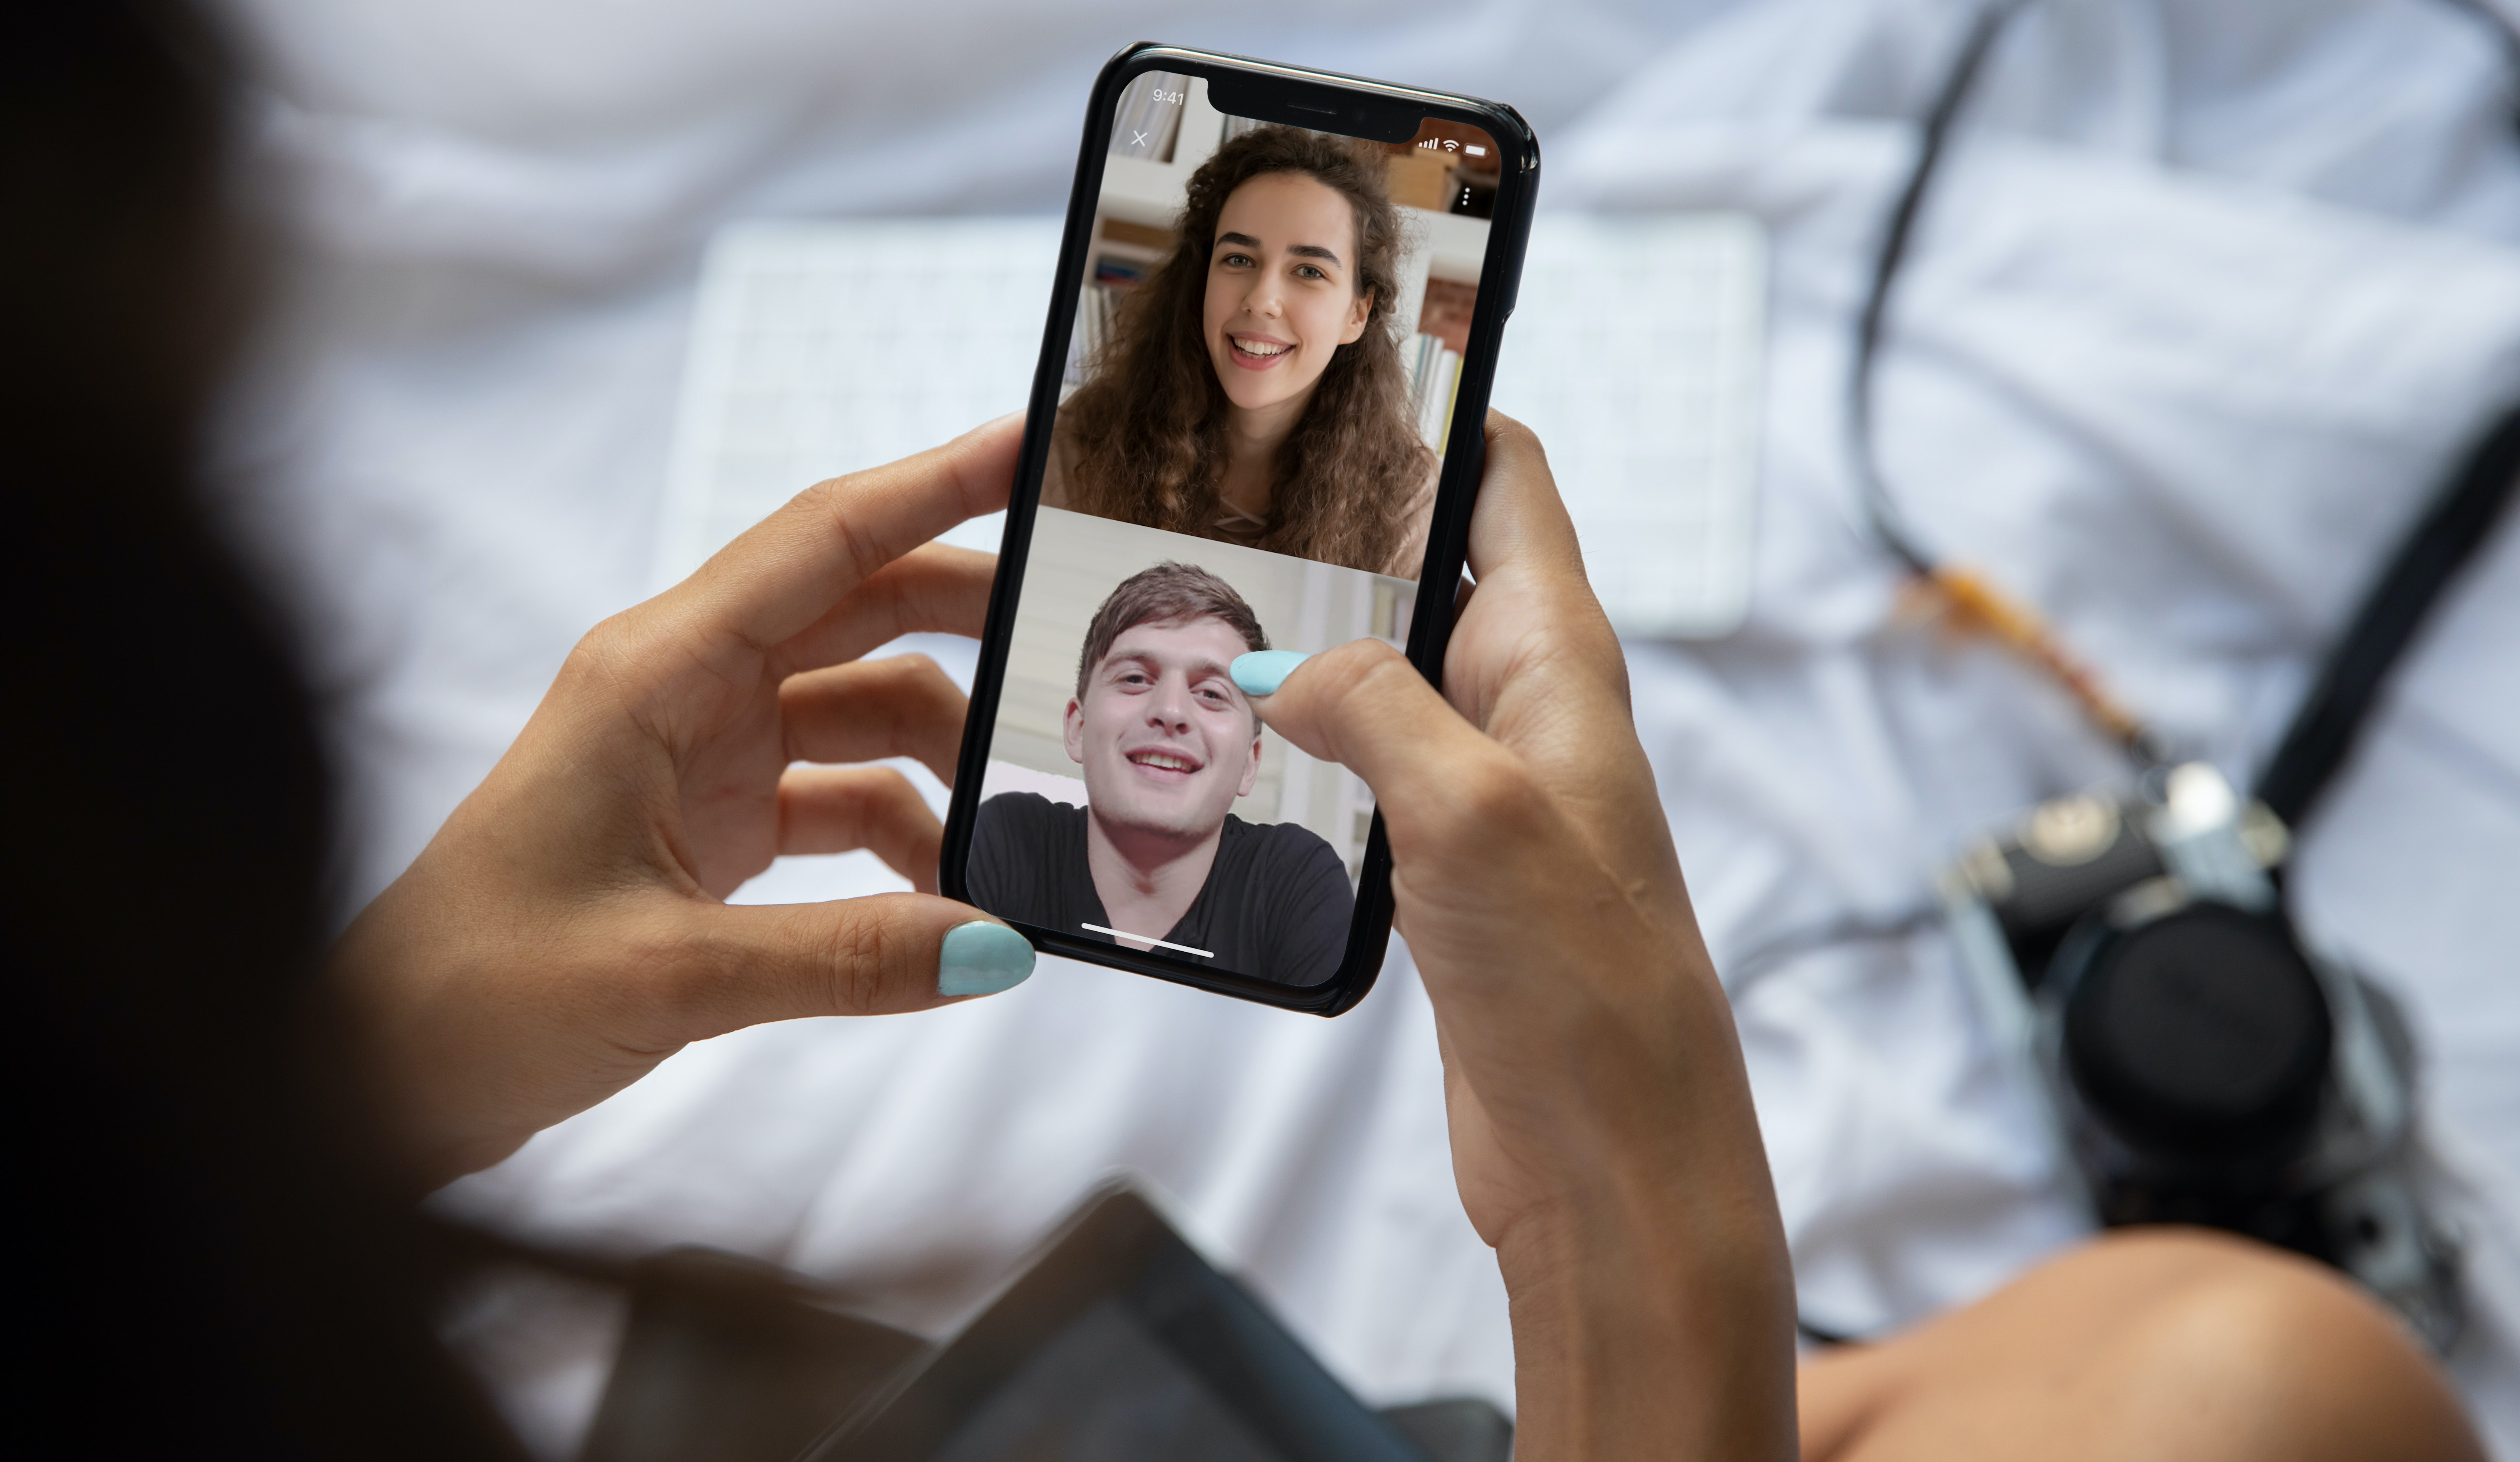 Meeting People Online: знакомимся онлайн и практикуем английский